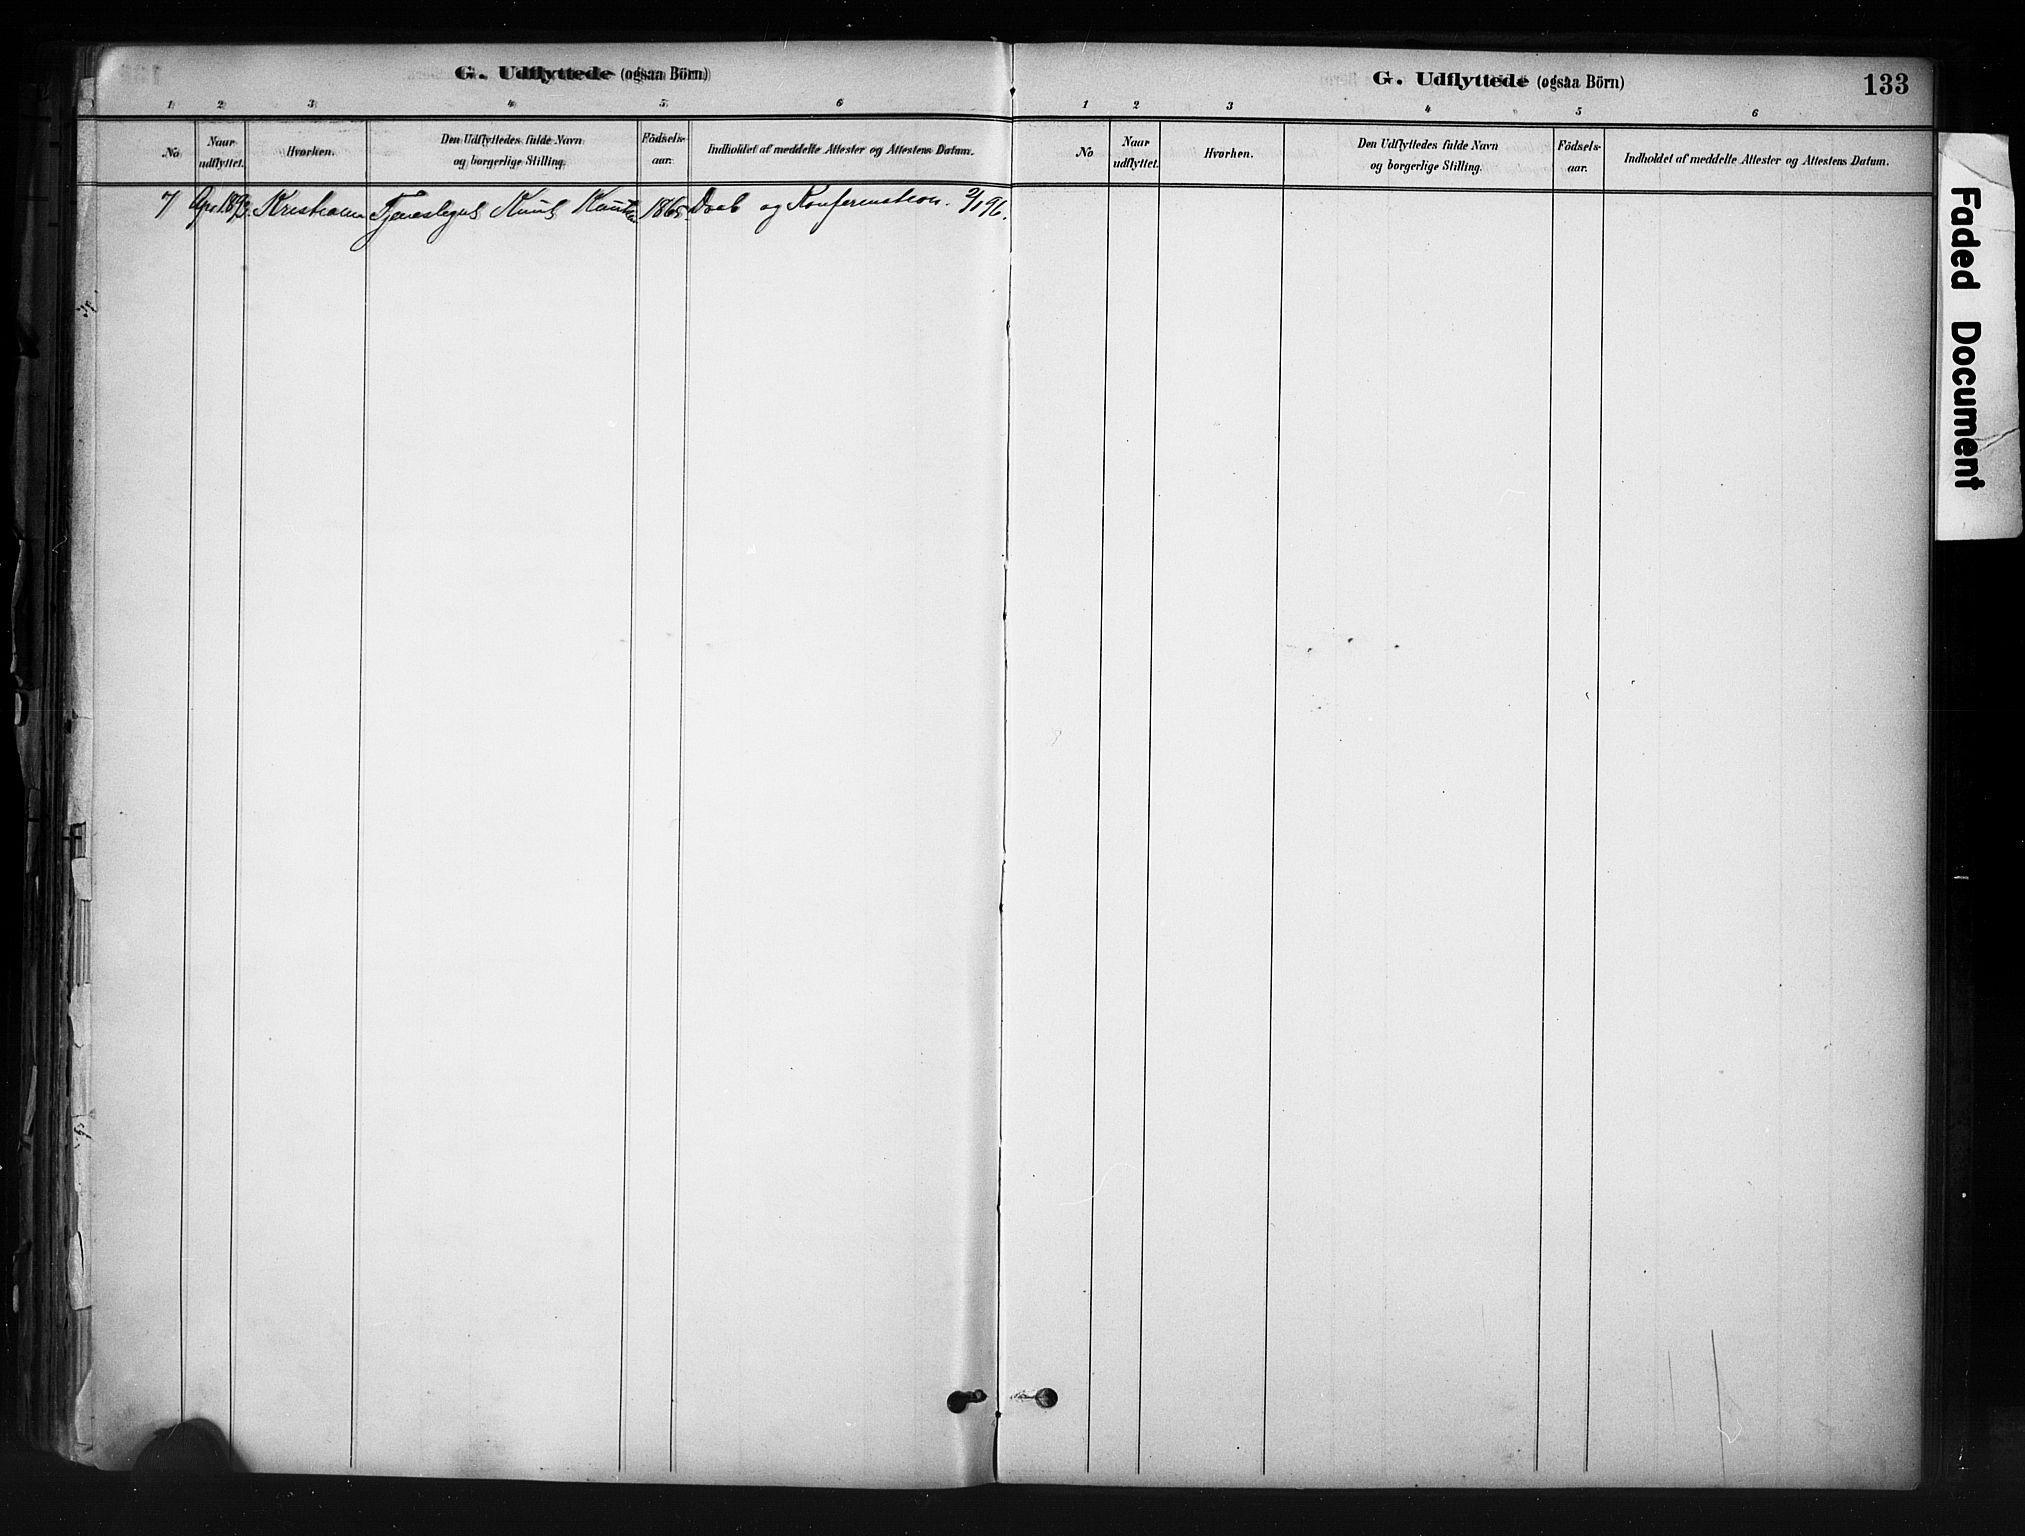 SAH, Nord-Aurdal prestekontor, Ministerialbok nr. 13, 1883-1895, s. 133